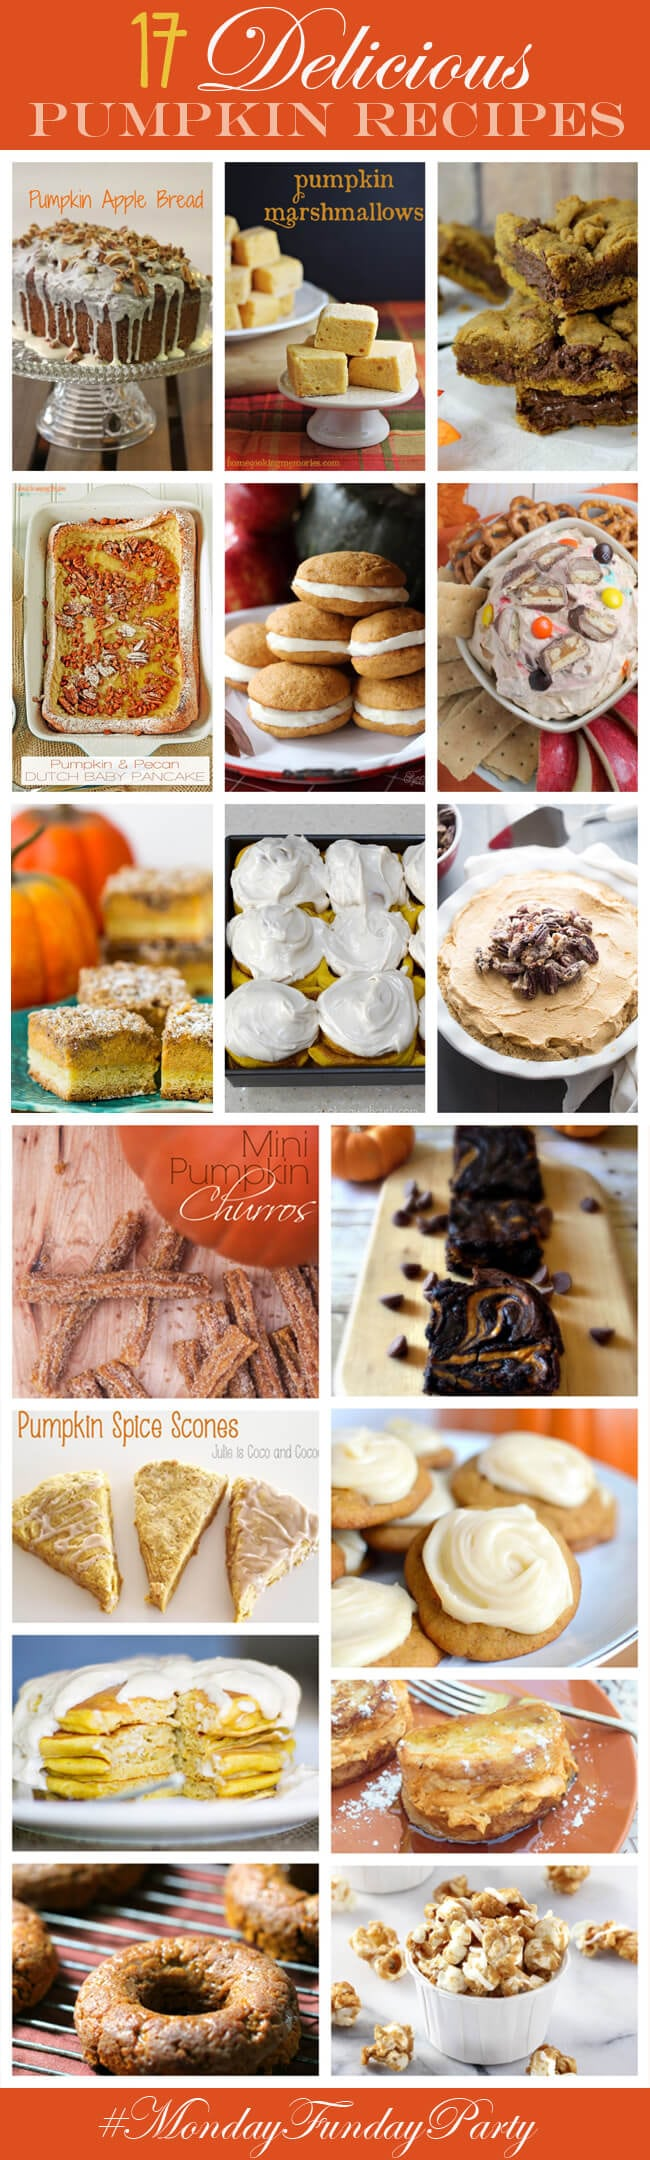 17 Pumpkin Recipes at thatswhatchesaid.com